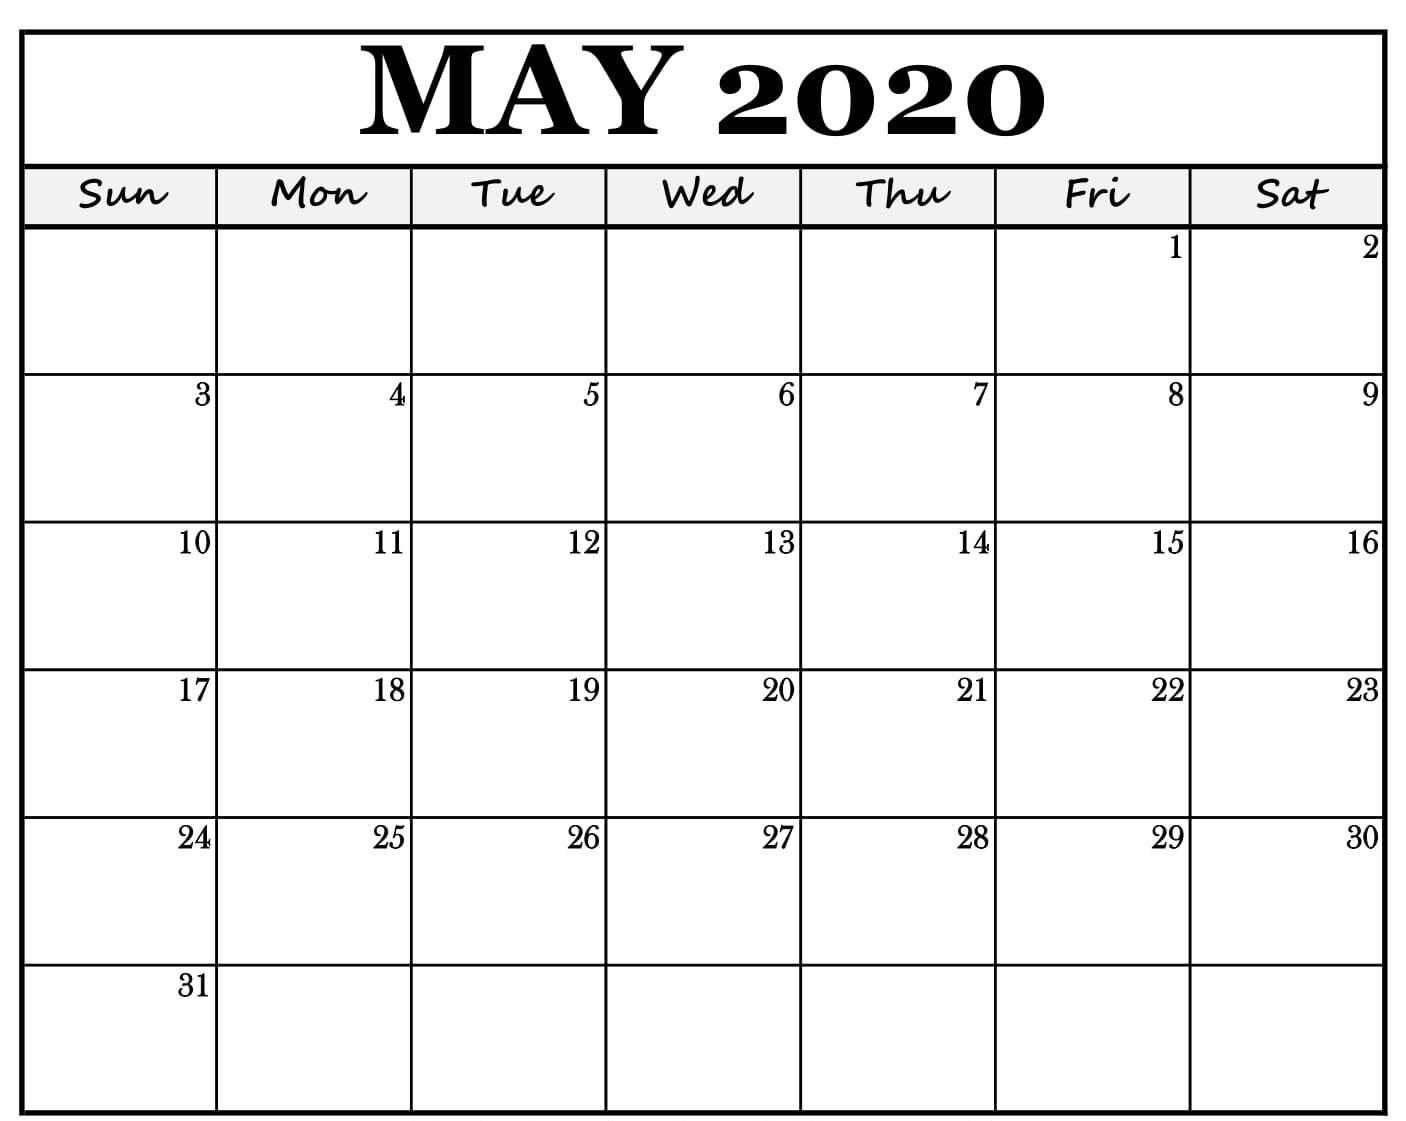 Editable May 2020 Calendar Template